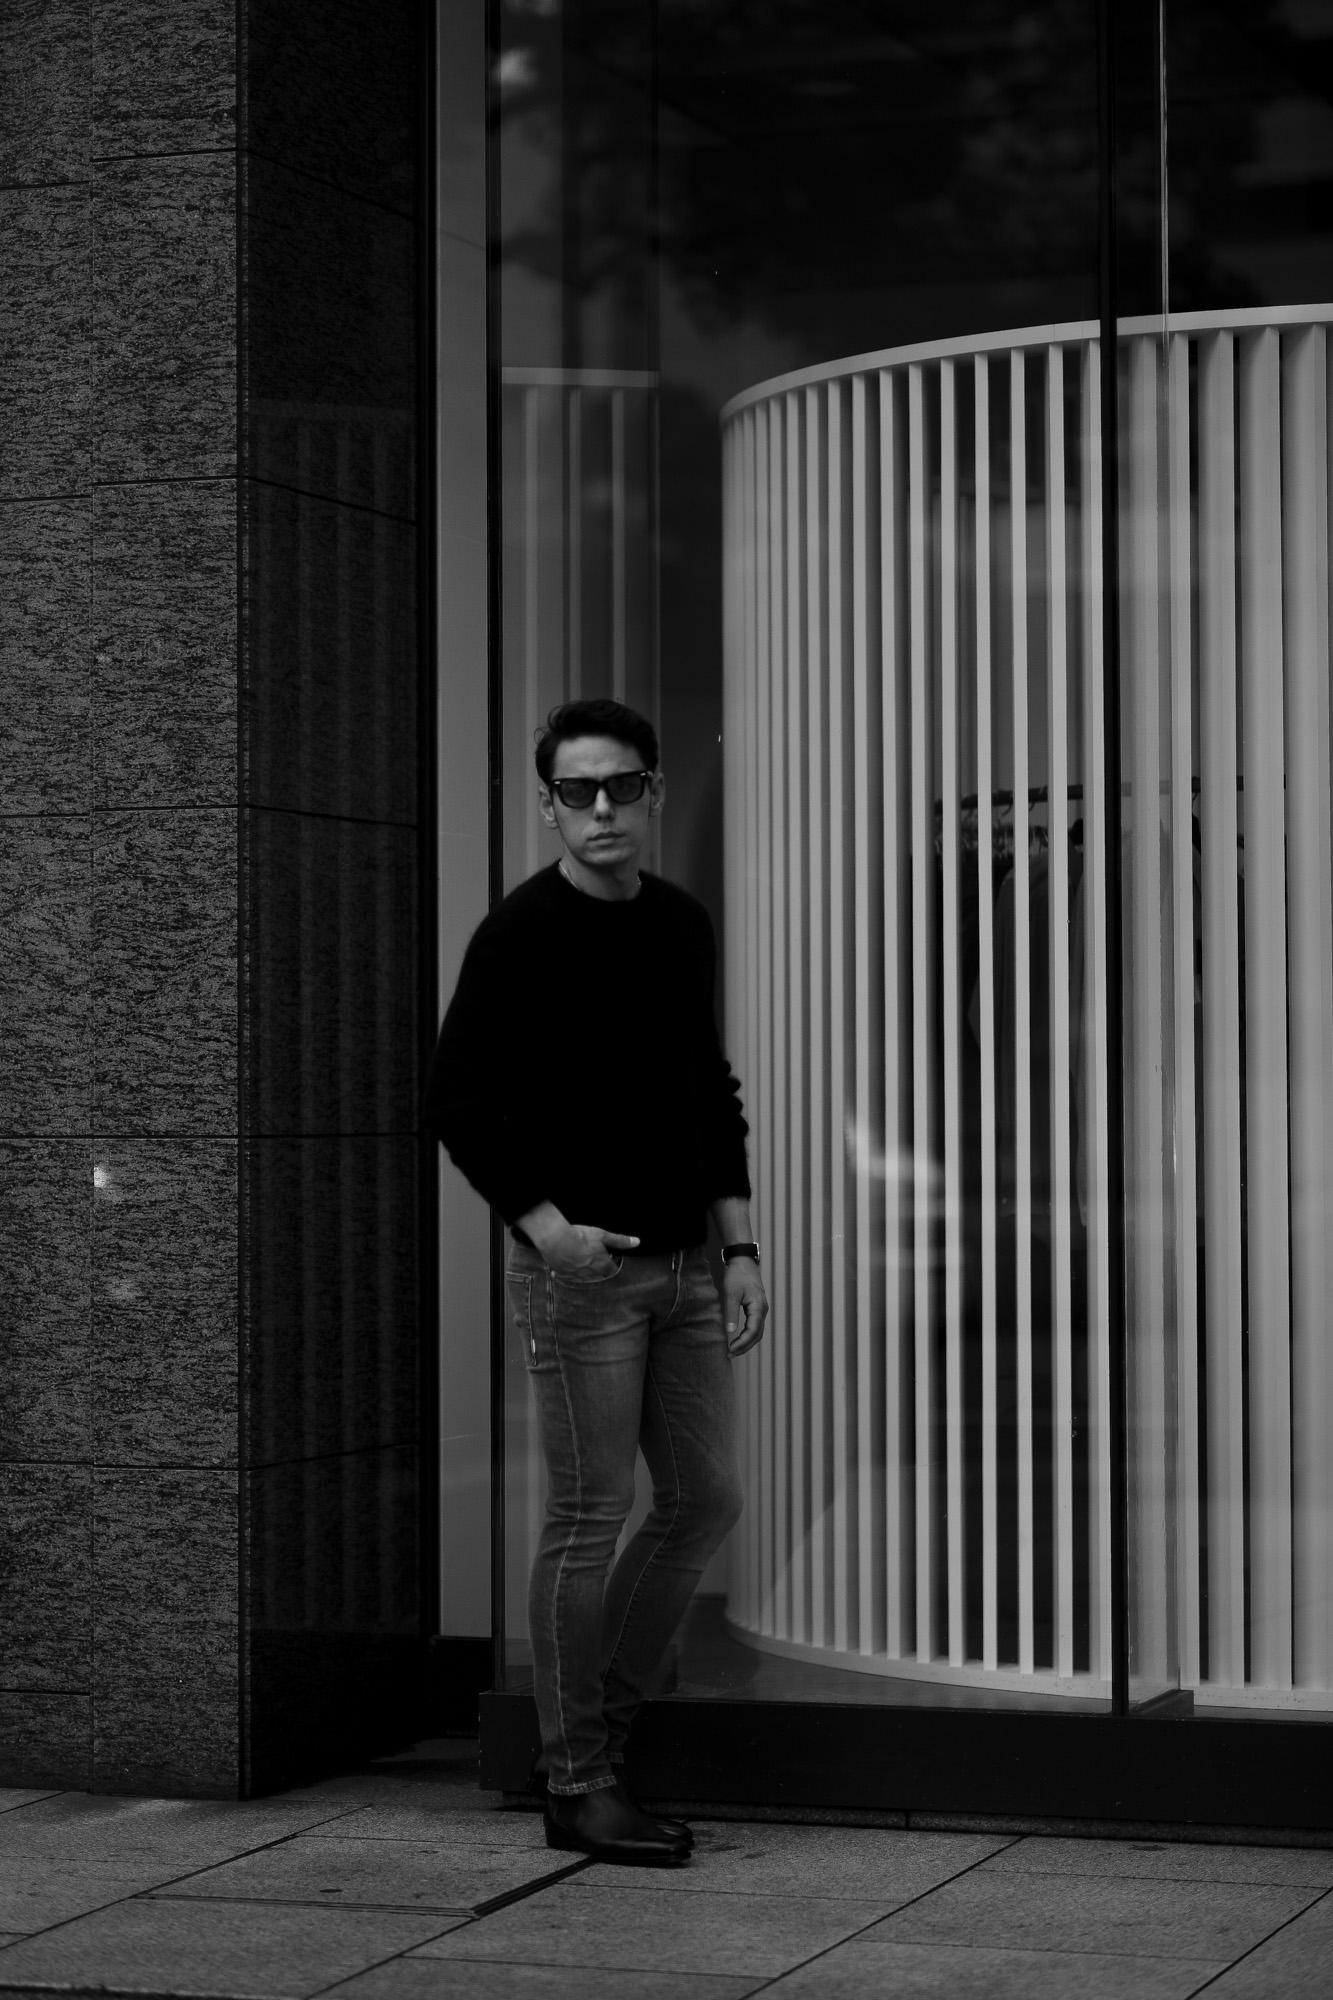 RIVORA (リヴォラ) GENTLE Knit Crew Neck (ジェントル ニット クルーネック) Cashmere Mohair Silk カシミア モヘア シルク ニット クルーネックセーター BLACK (ブラック・010) MADE IN JAPAN (日本製)  2021 秋冬 愛知 名古屋 Alto e Diritto altoediritto アルトエデリット